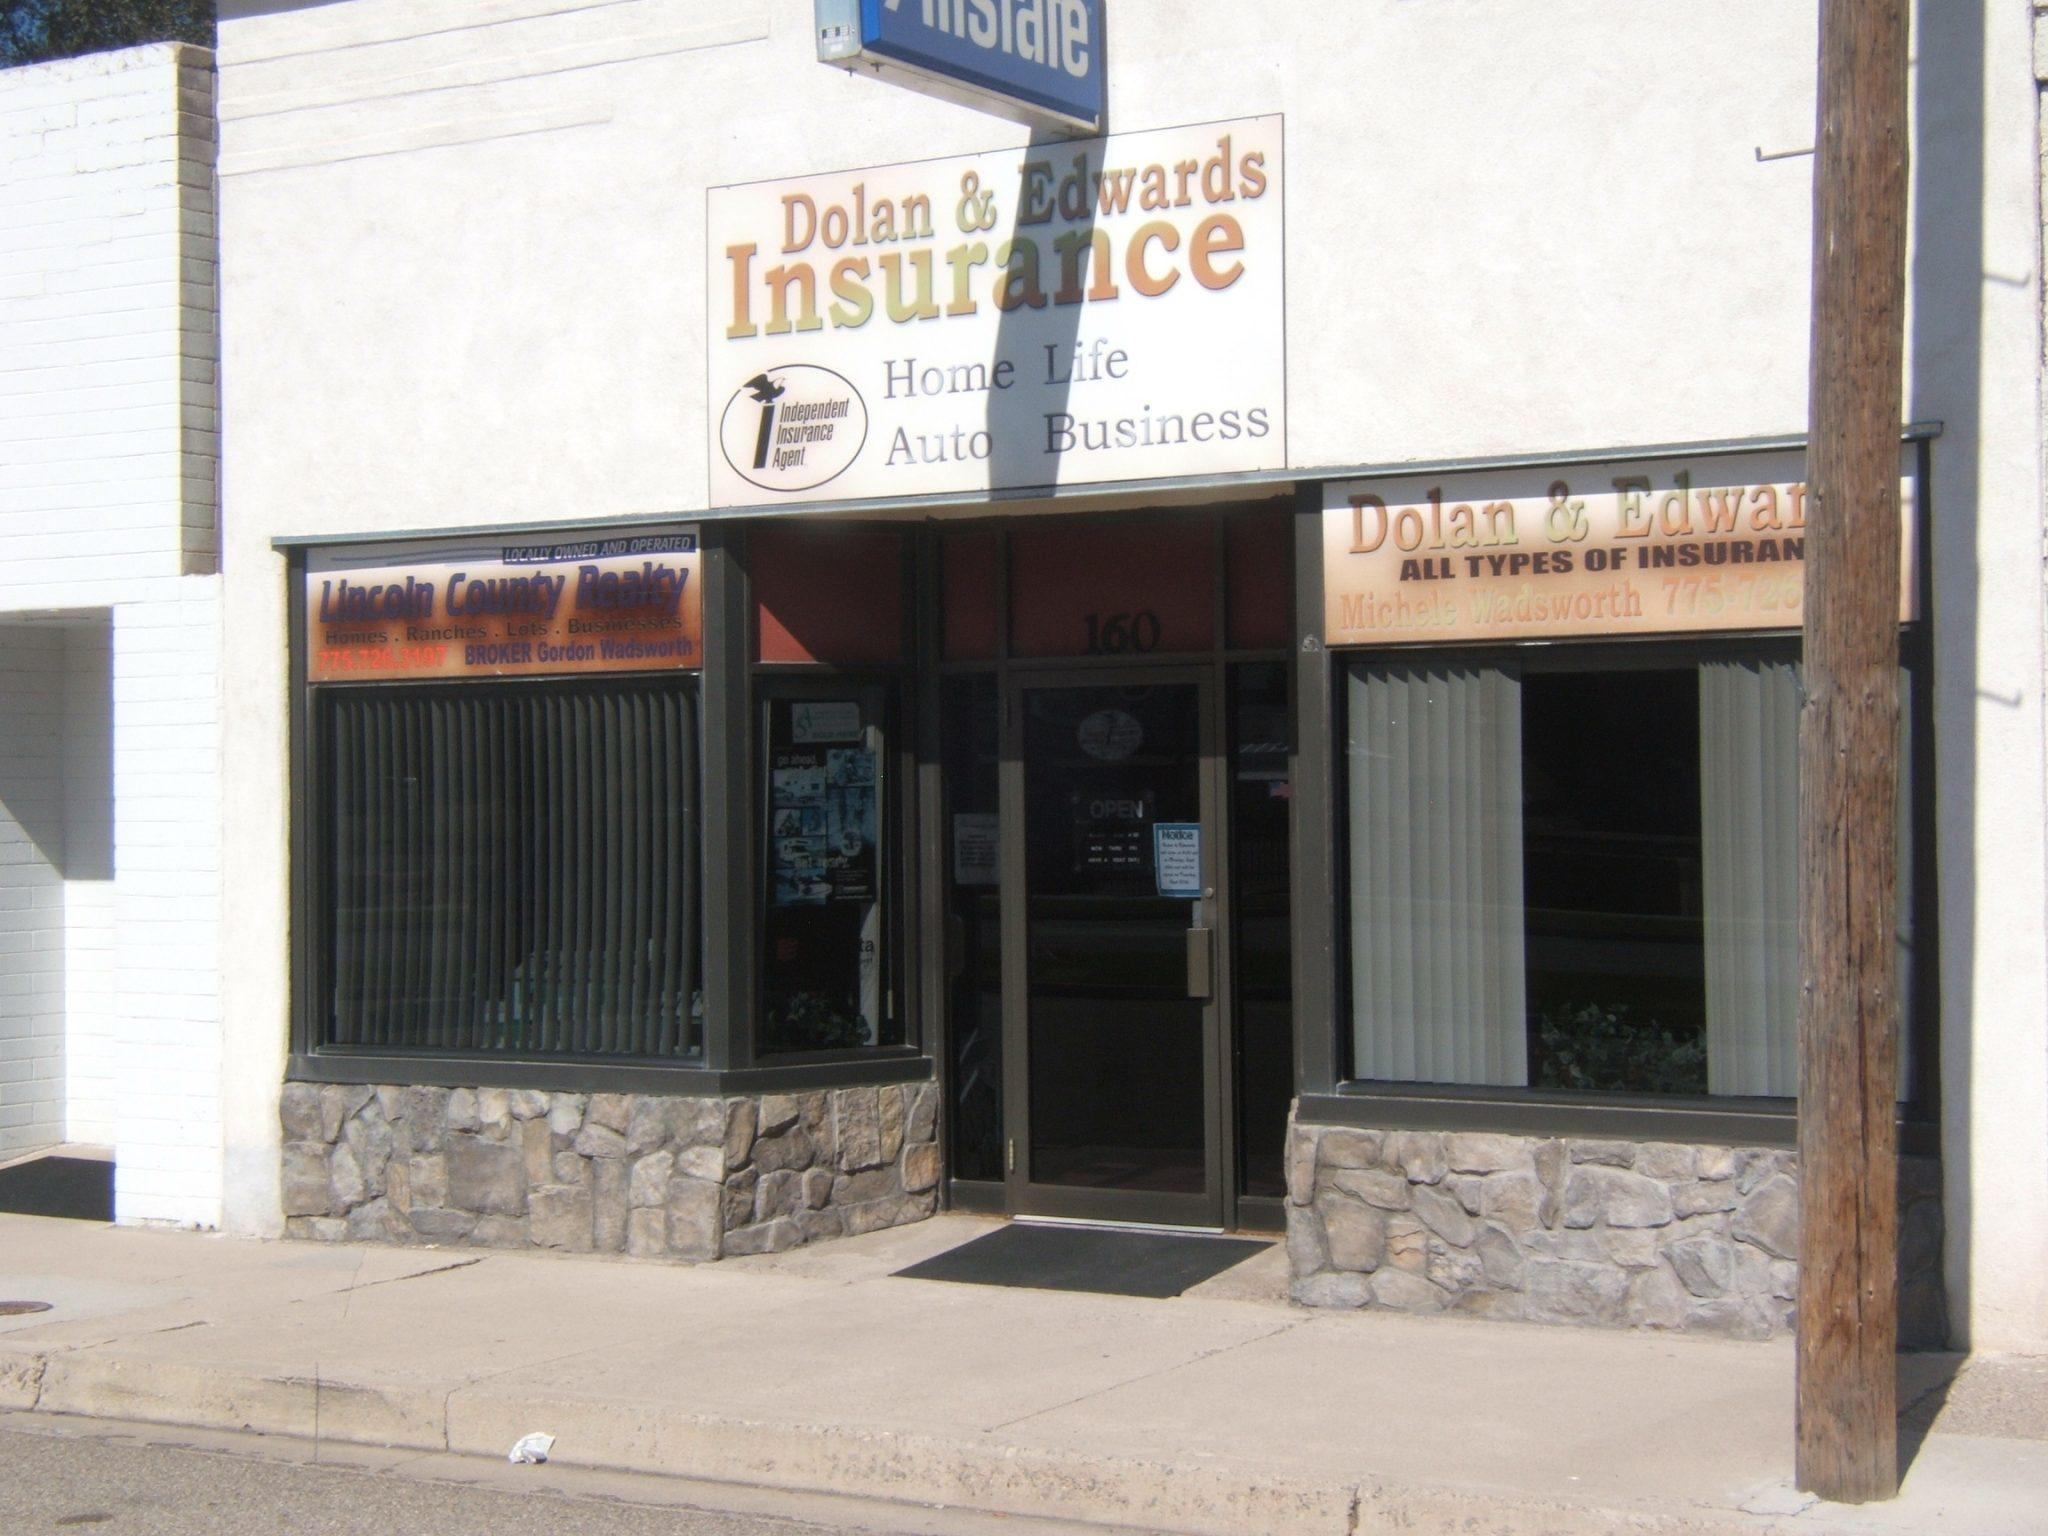 Dolan & Edwards Financial Services